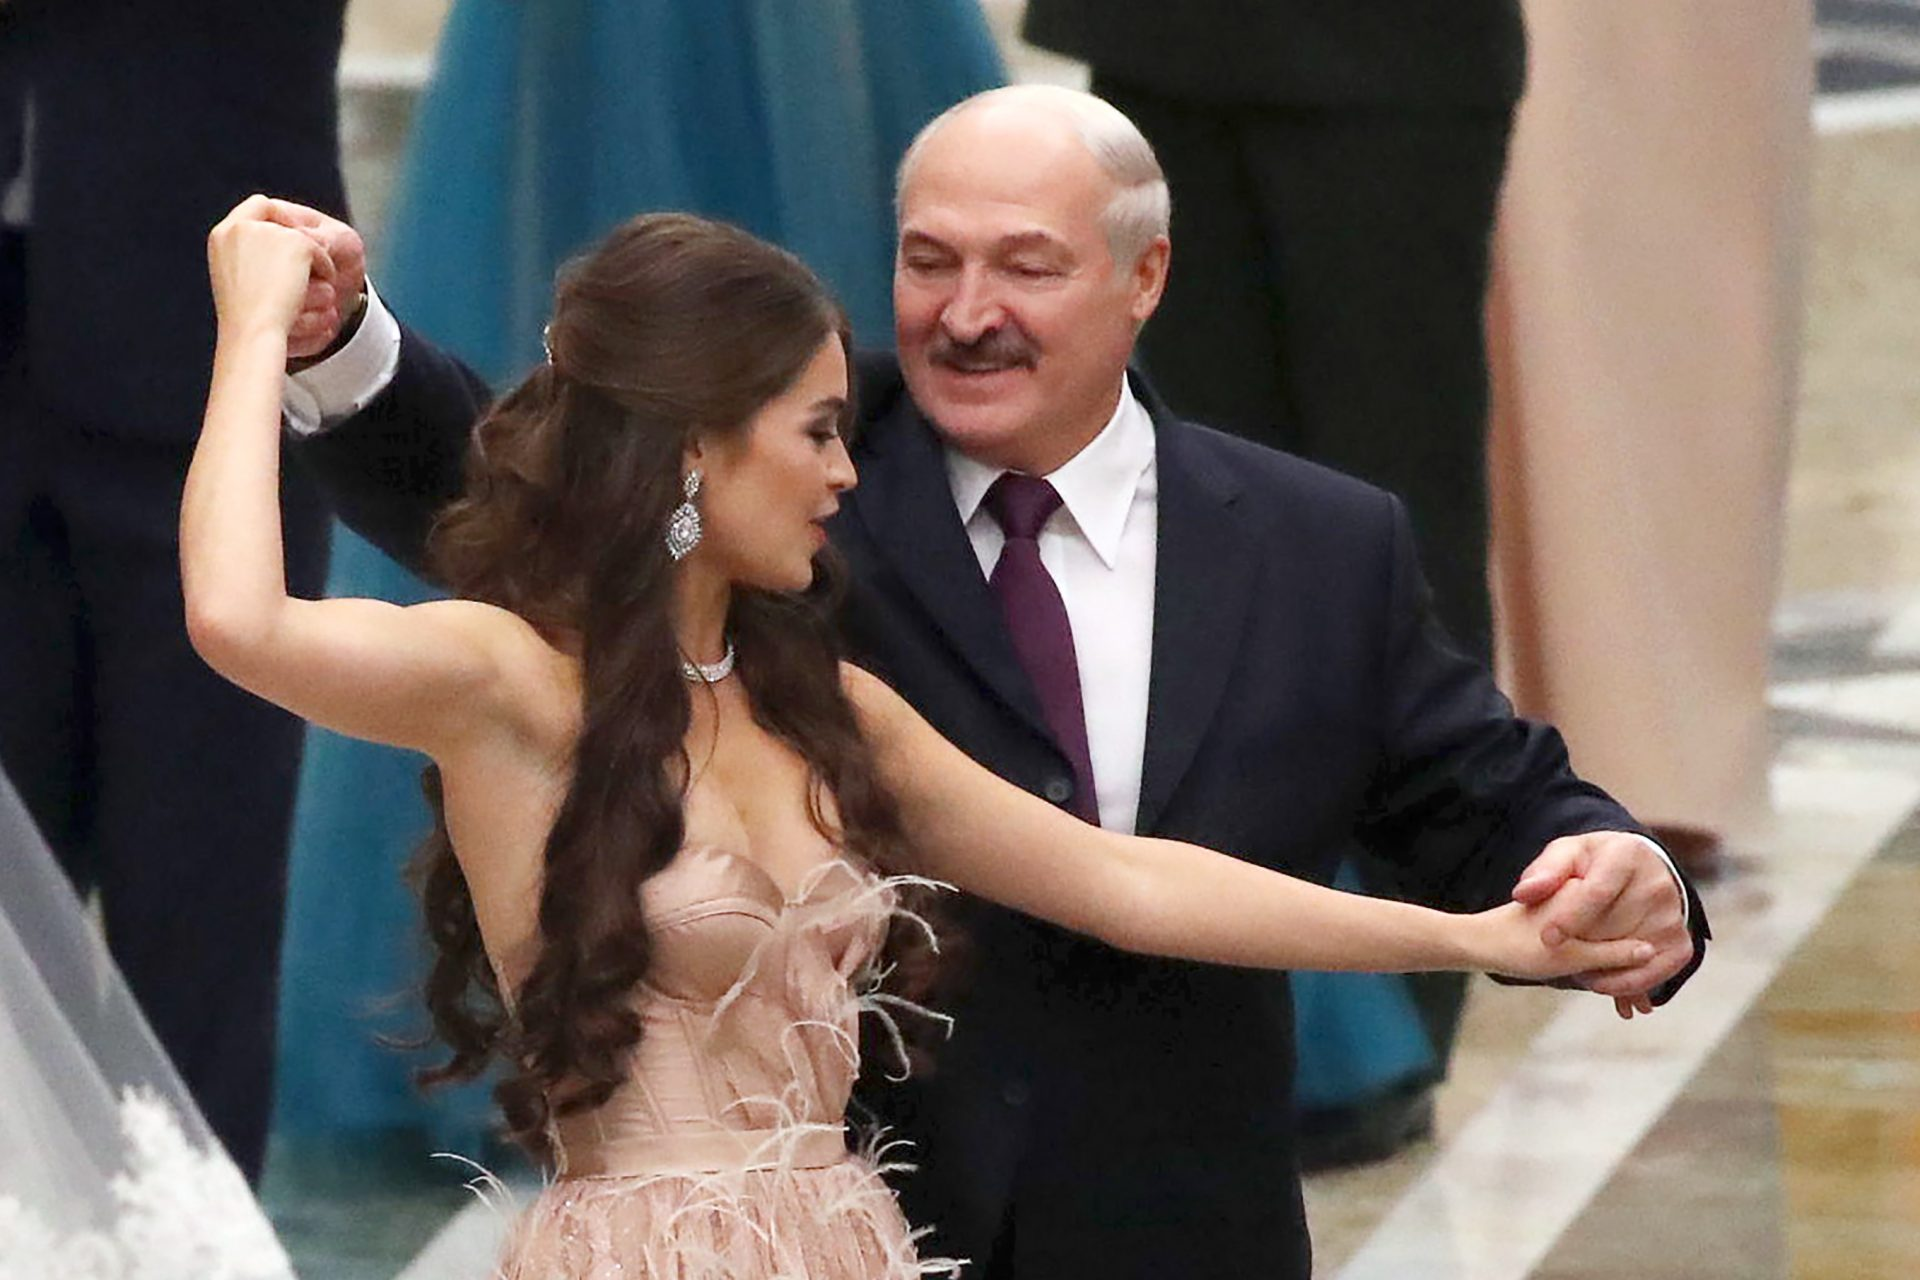 Miss Belarus 2018 Winner Maria Vasilevich (L) and Belarus' President Alexander Lukashenko dance at the republican Christmas youth ball. Photograph: Maxim Guchek/Getty Images.